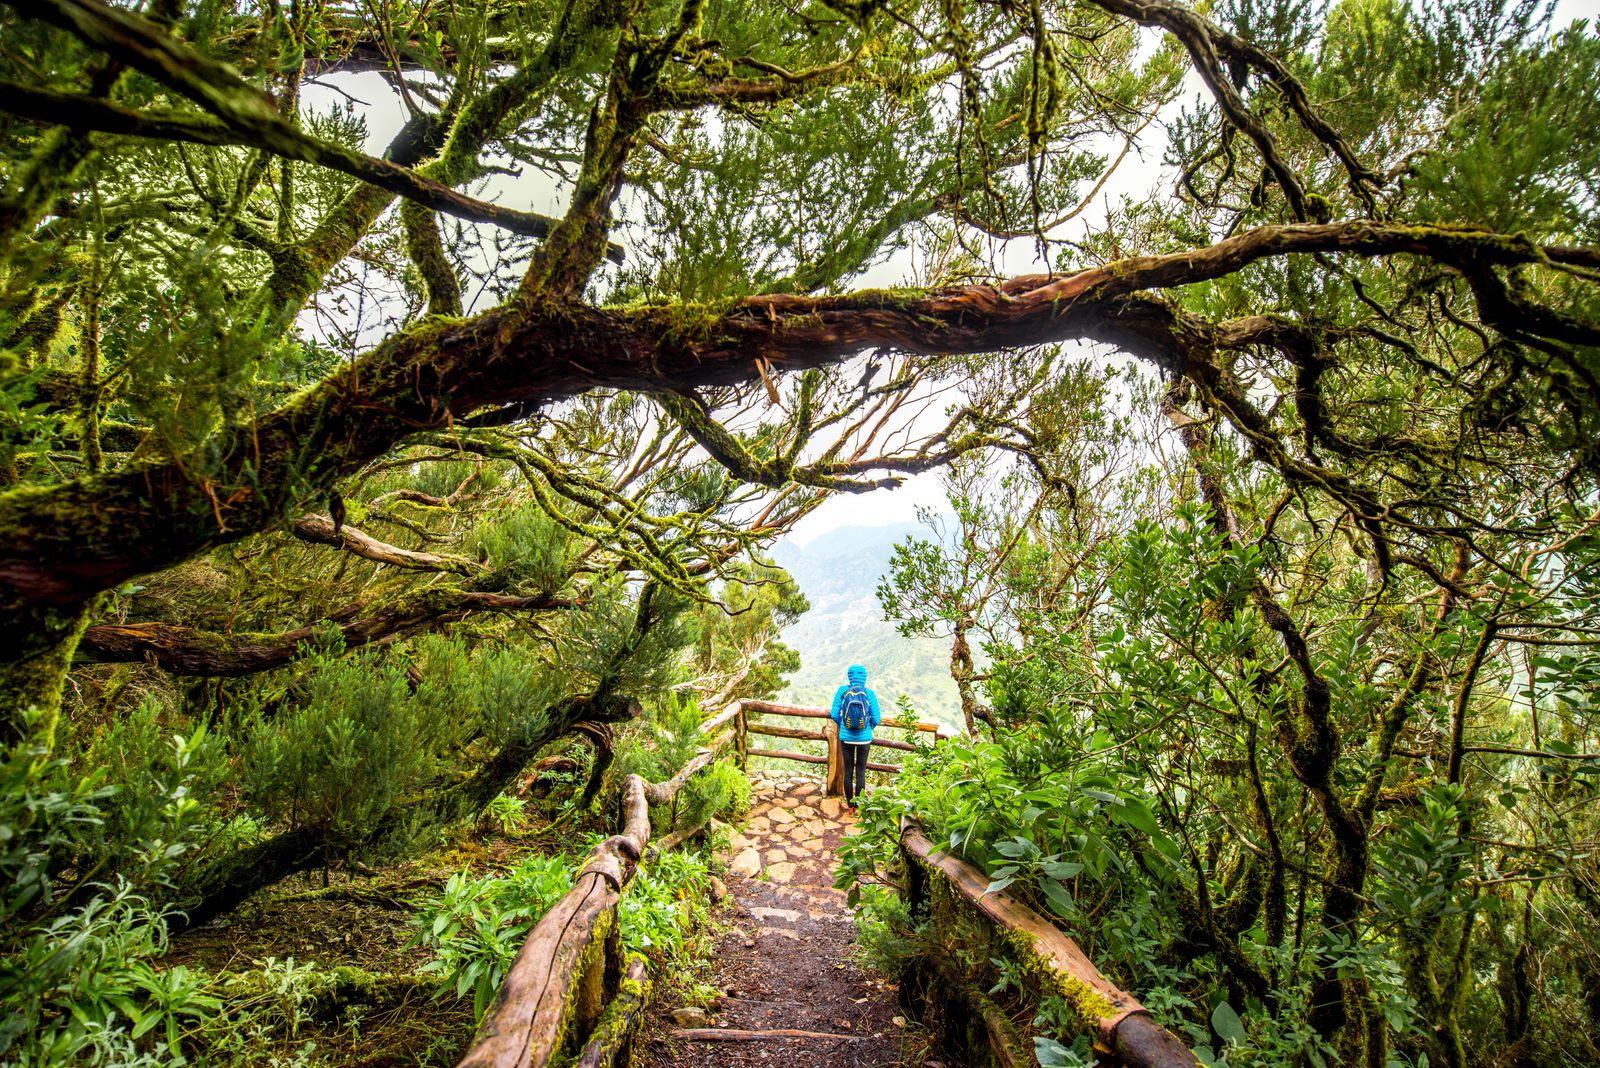 EINMALIGE VERWENDUNG Garajonay-Nationalpark auf La Gomera